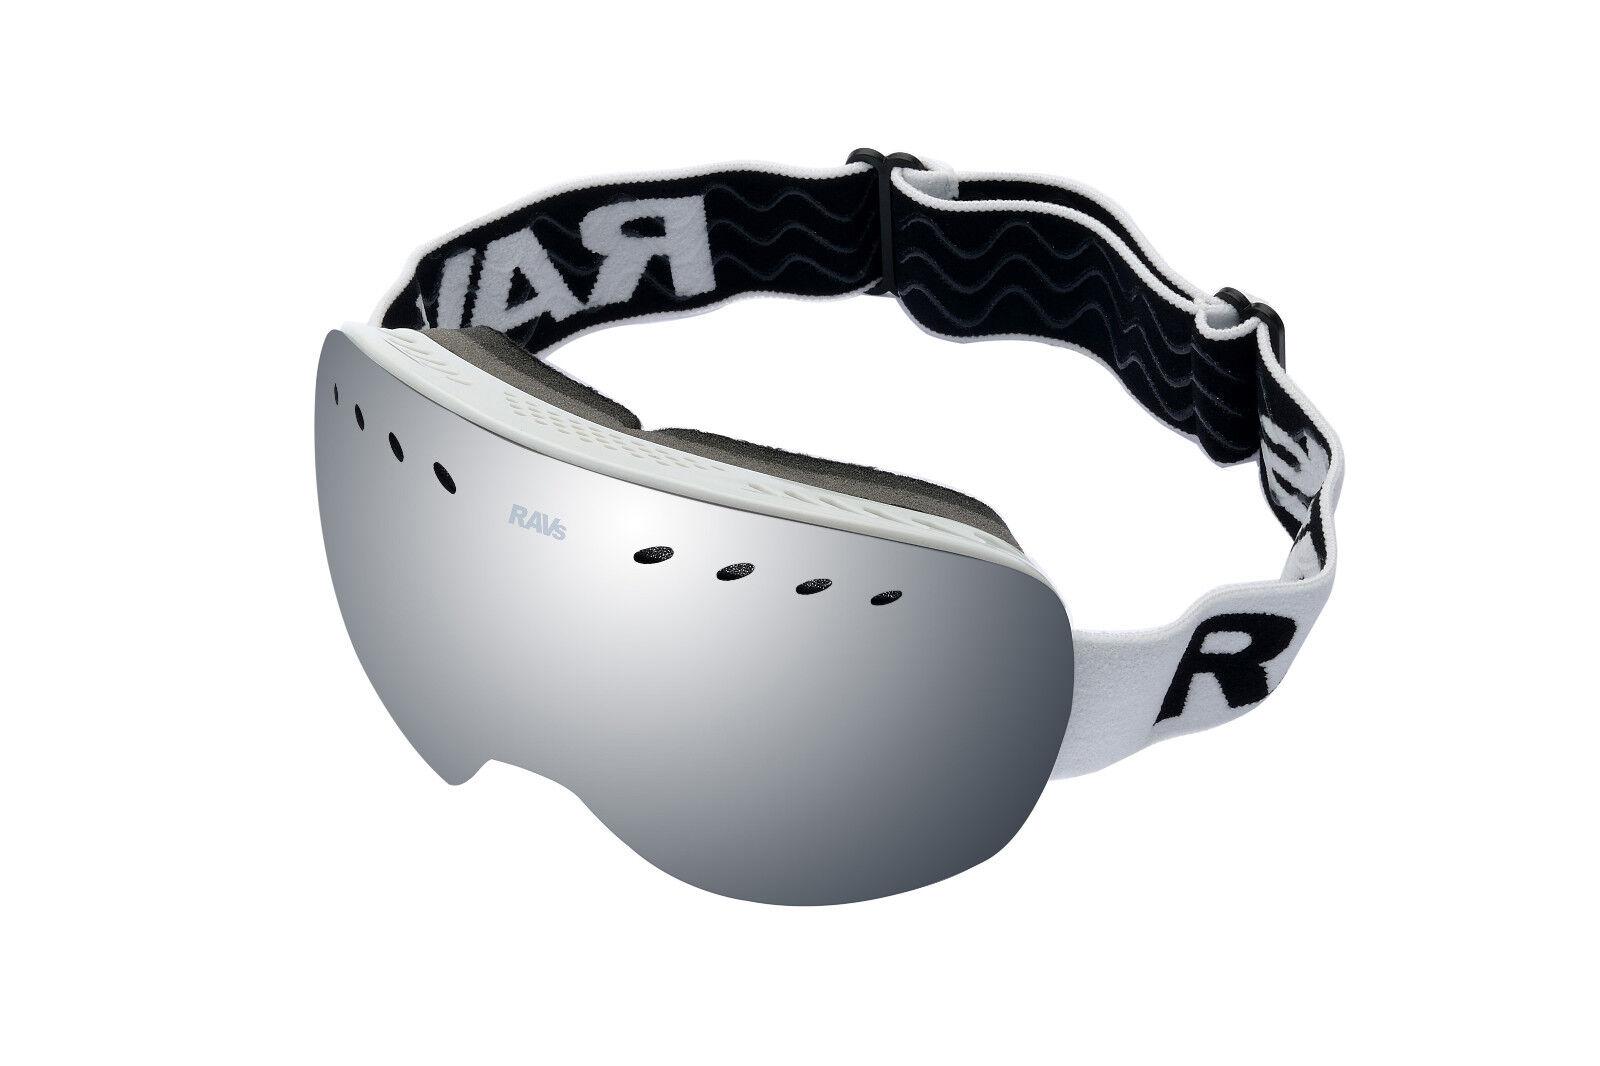 Ravs Ski Goggles Snow Snowboard Goggles Glacier Goggles for Eyeglass Wearers